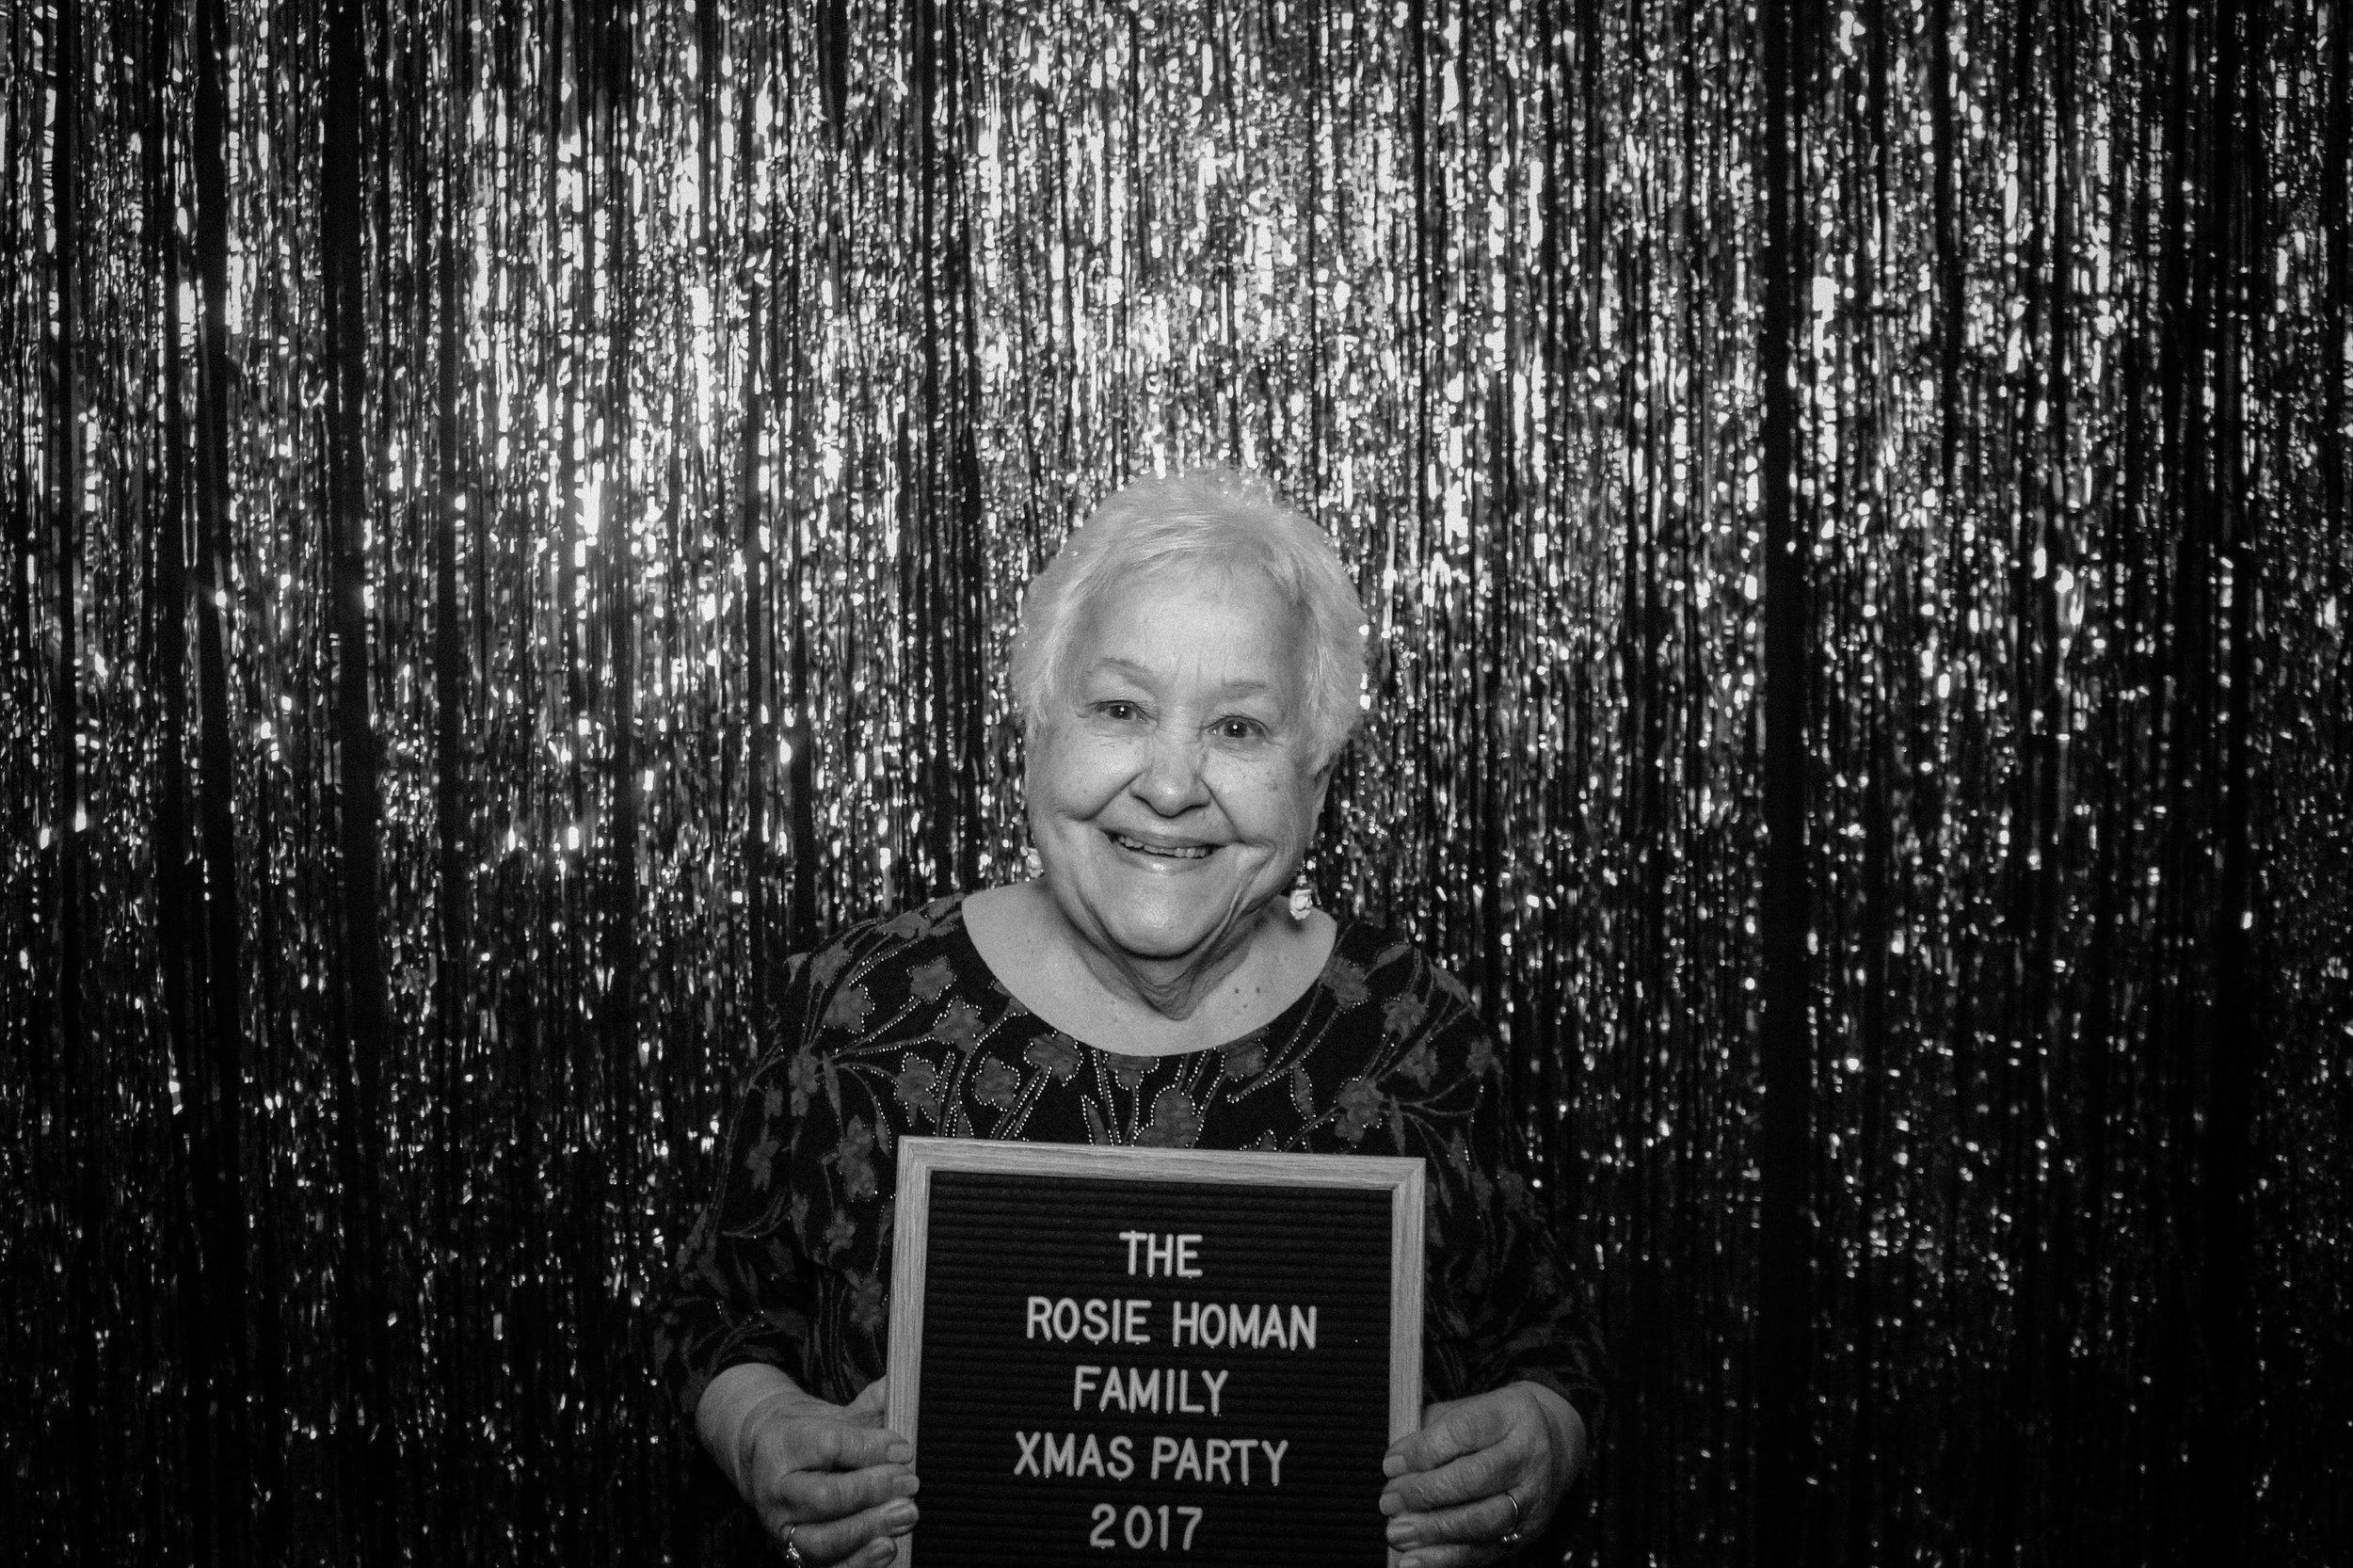 Rosie Homan Xmas Party 2017-049.jpg